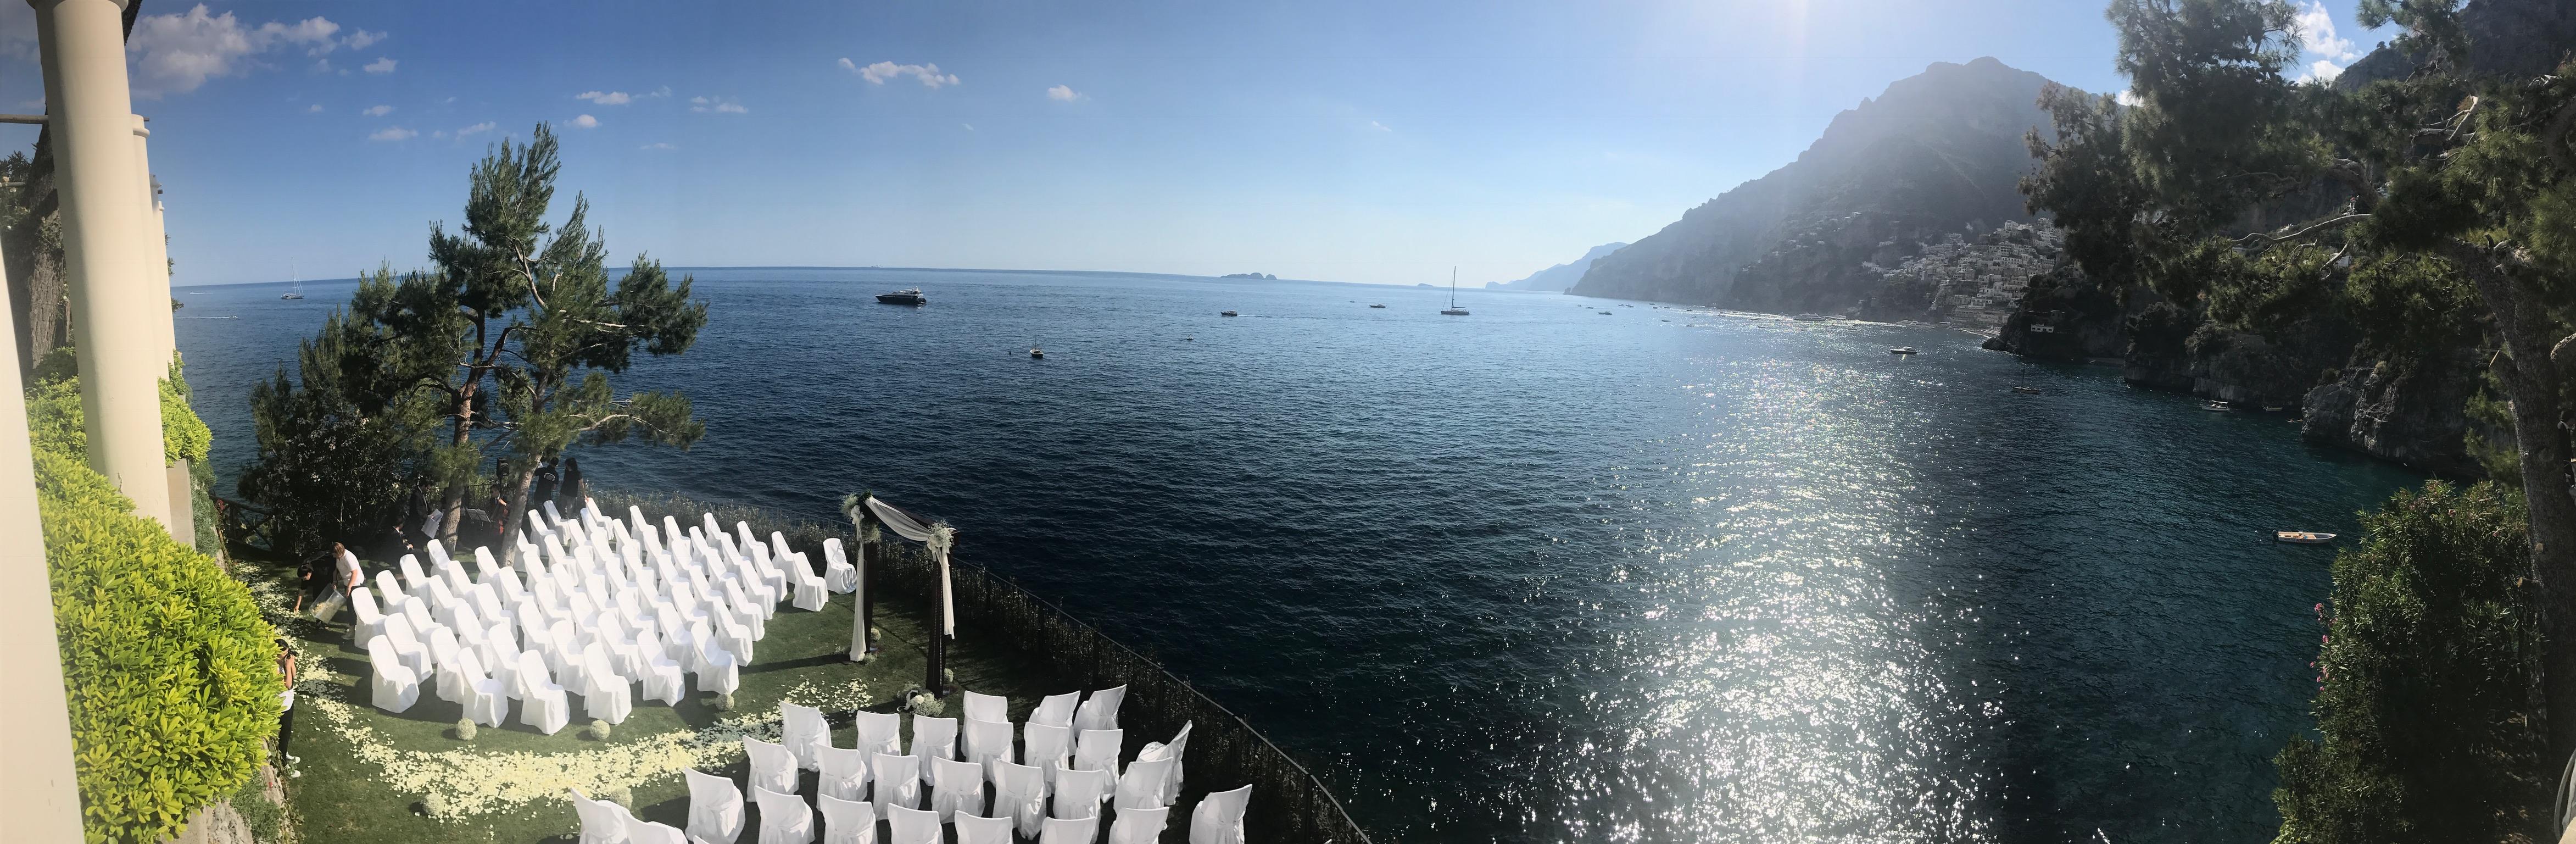 https://www.weddingamalfi.com/wp-content/uploads/Nathalie-and-Benjamin-wedding-in-Positano-22.jpg